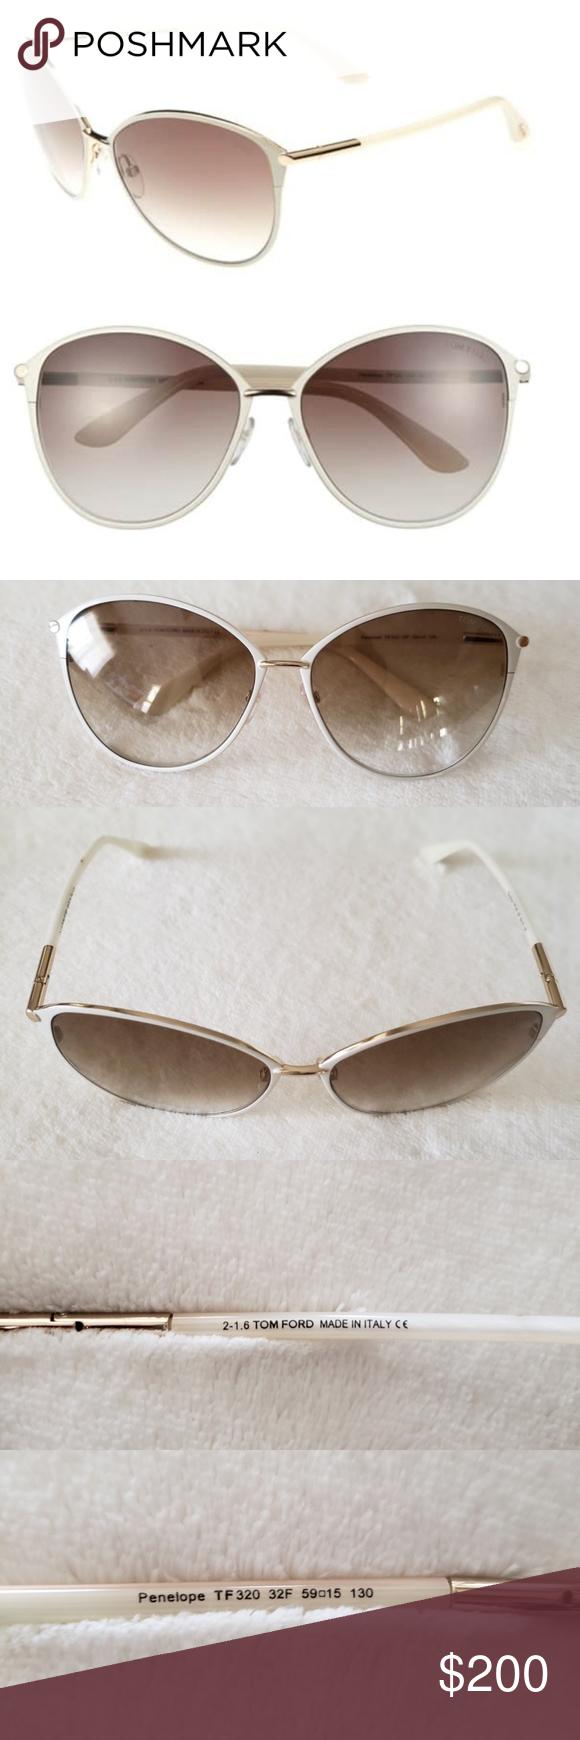 8ac78bc54ce EUC Tom Ford Penelope Cat-Eye Metal Sunglasses  EUC Tom Ford Penelope Cat-